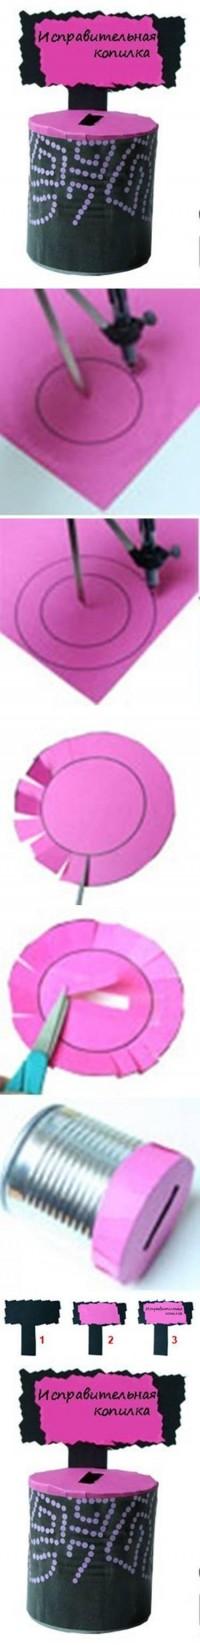 DIY Cute Piggy Bank DIY Projects | UsefulDIY.com